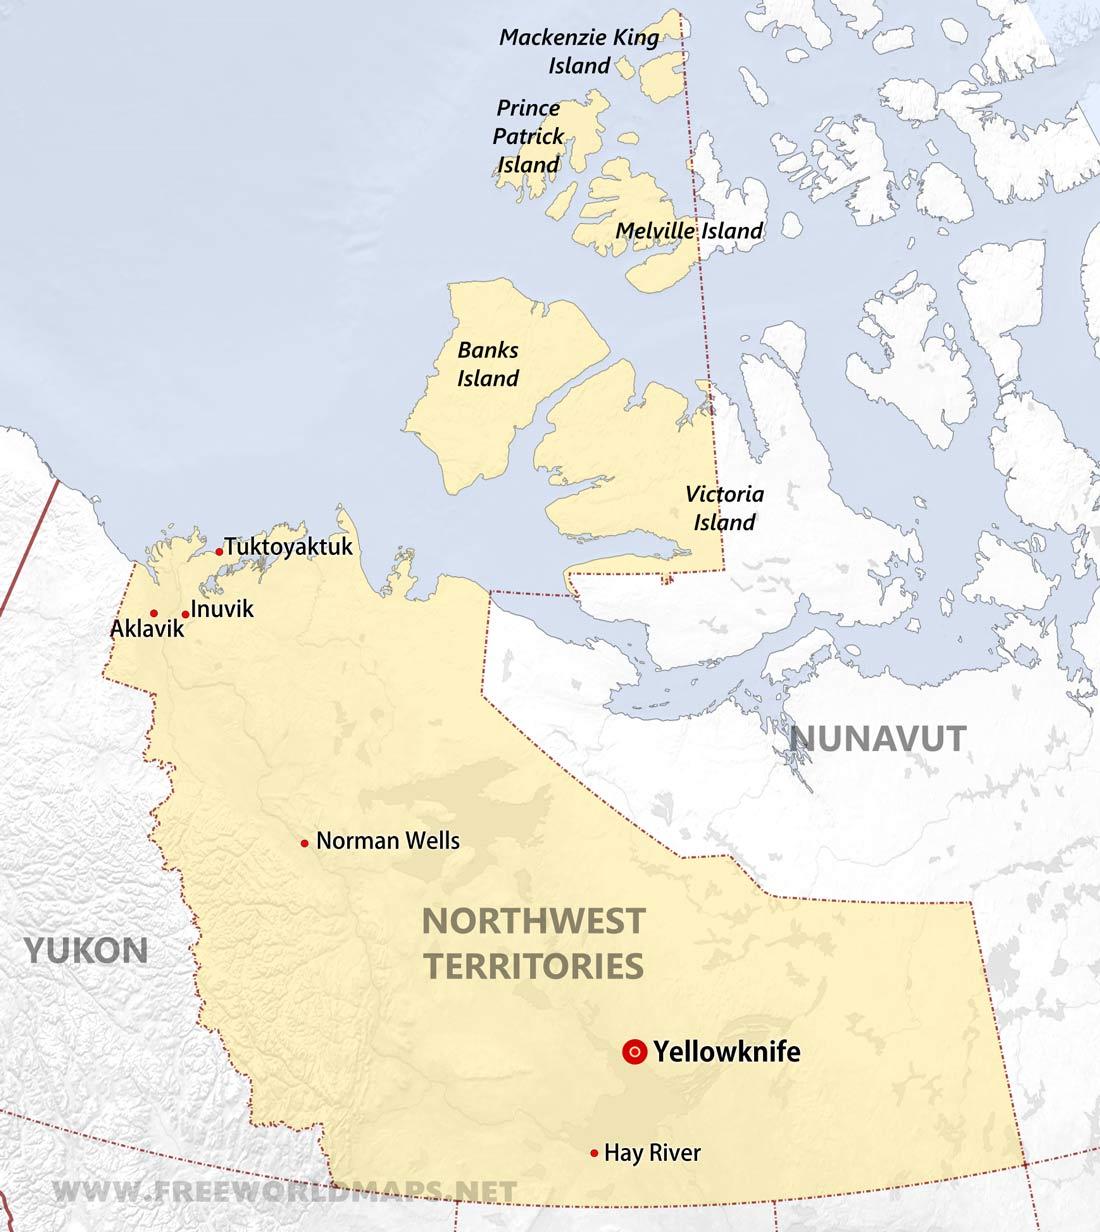 Northwest Territories Maps